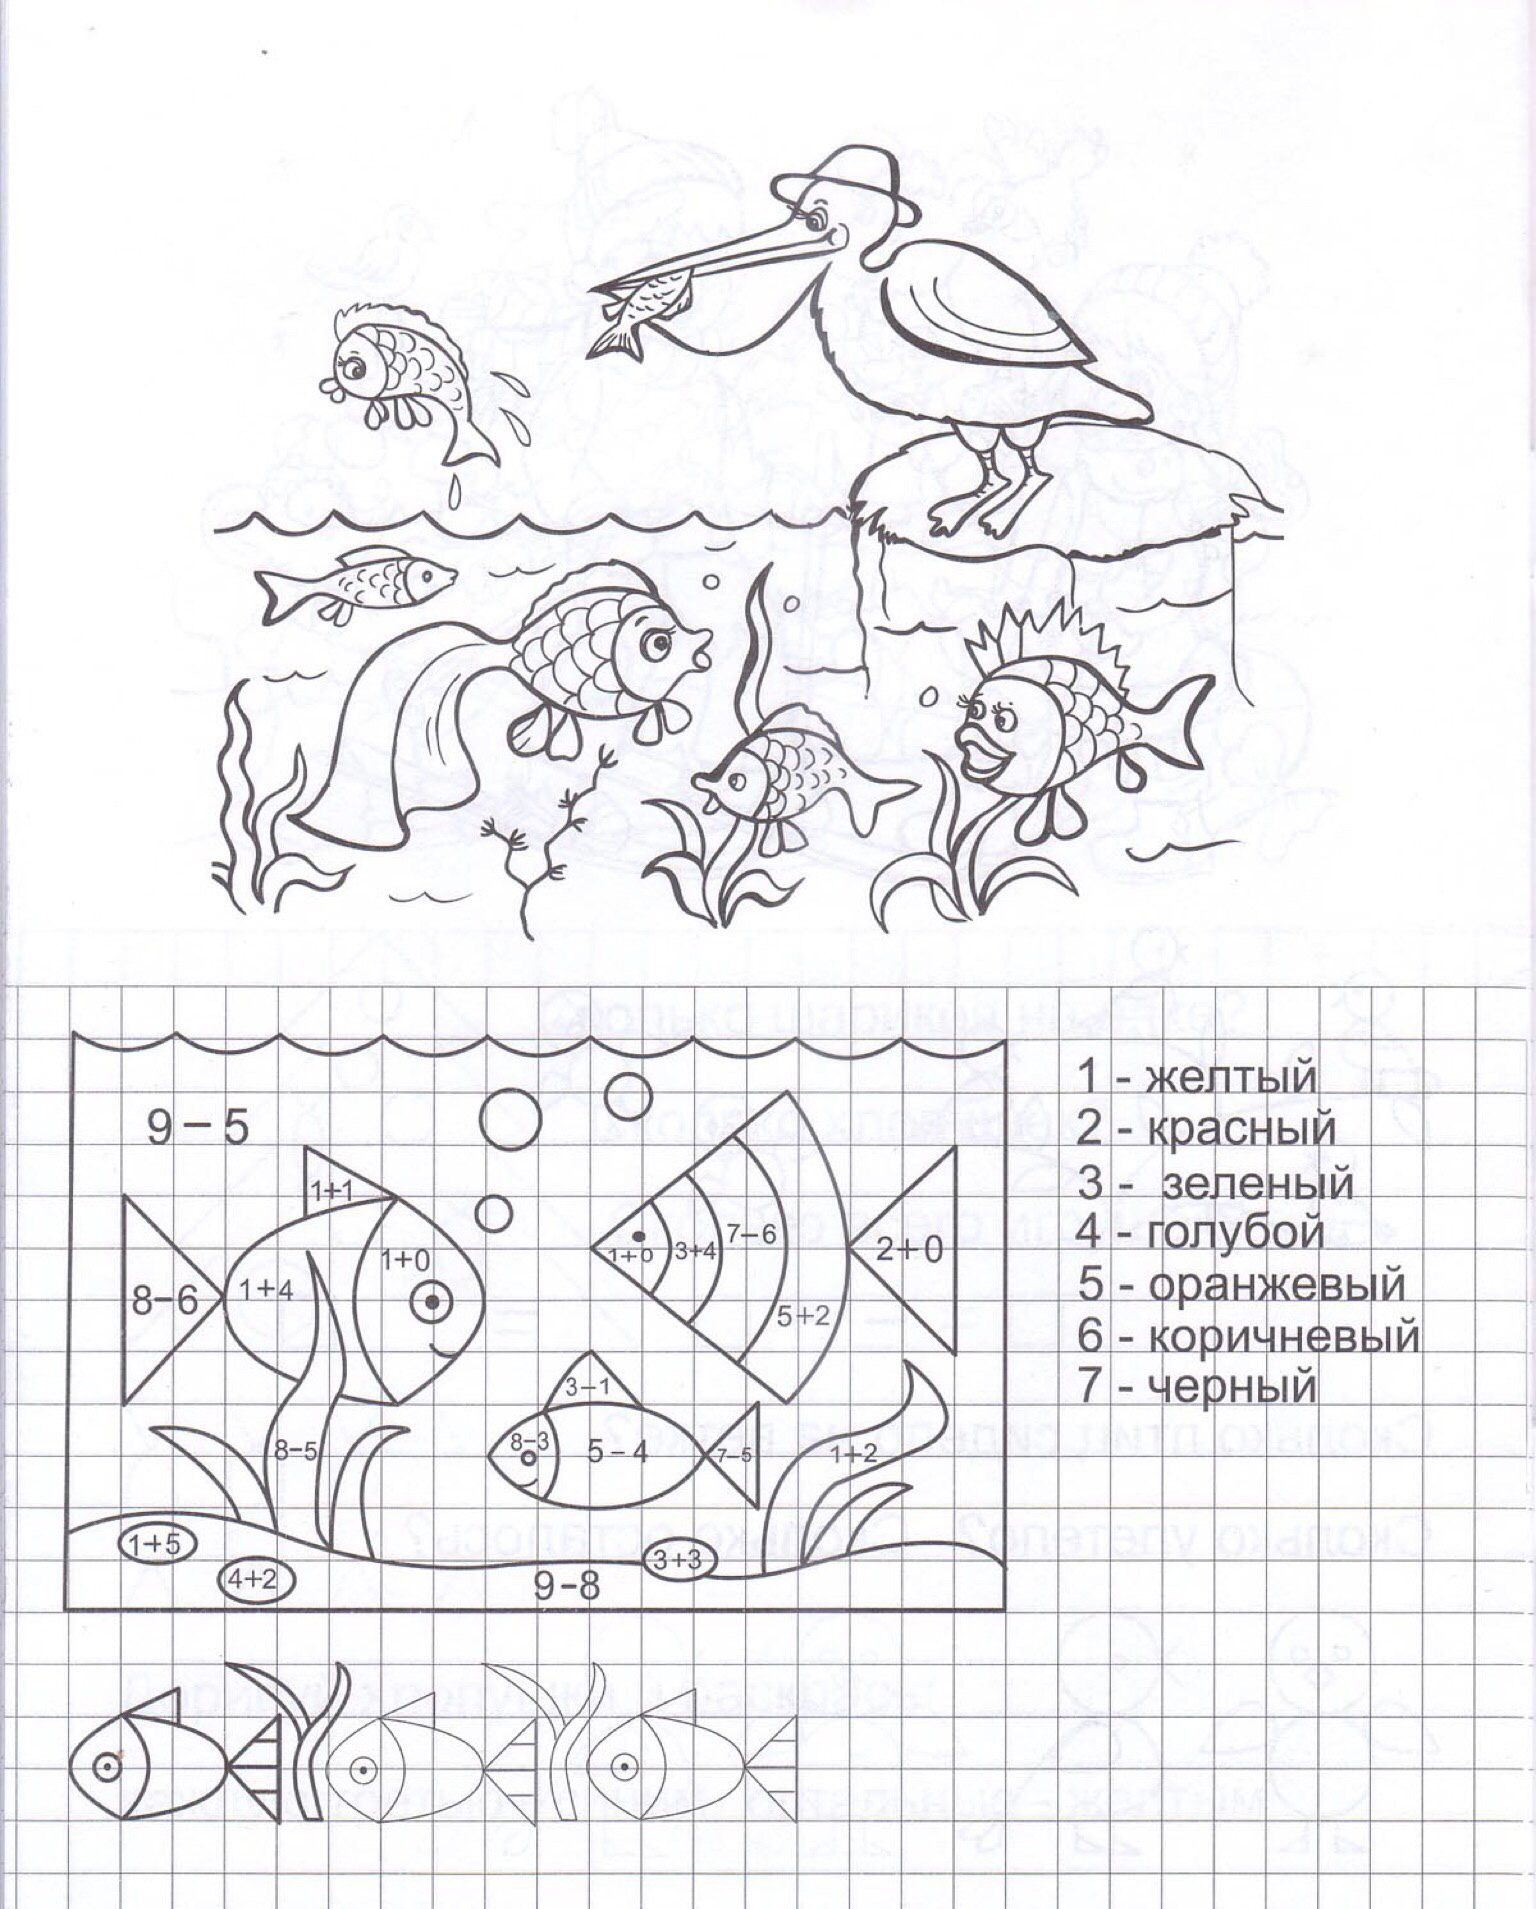 Pin By Danuta Cichura On Szlaczki